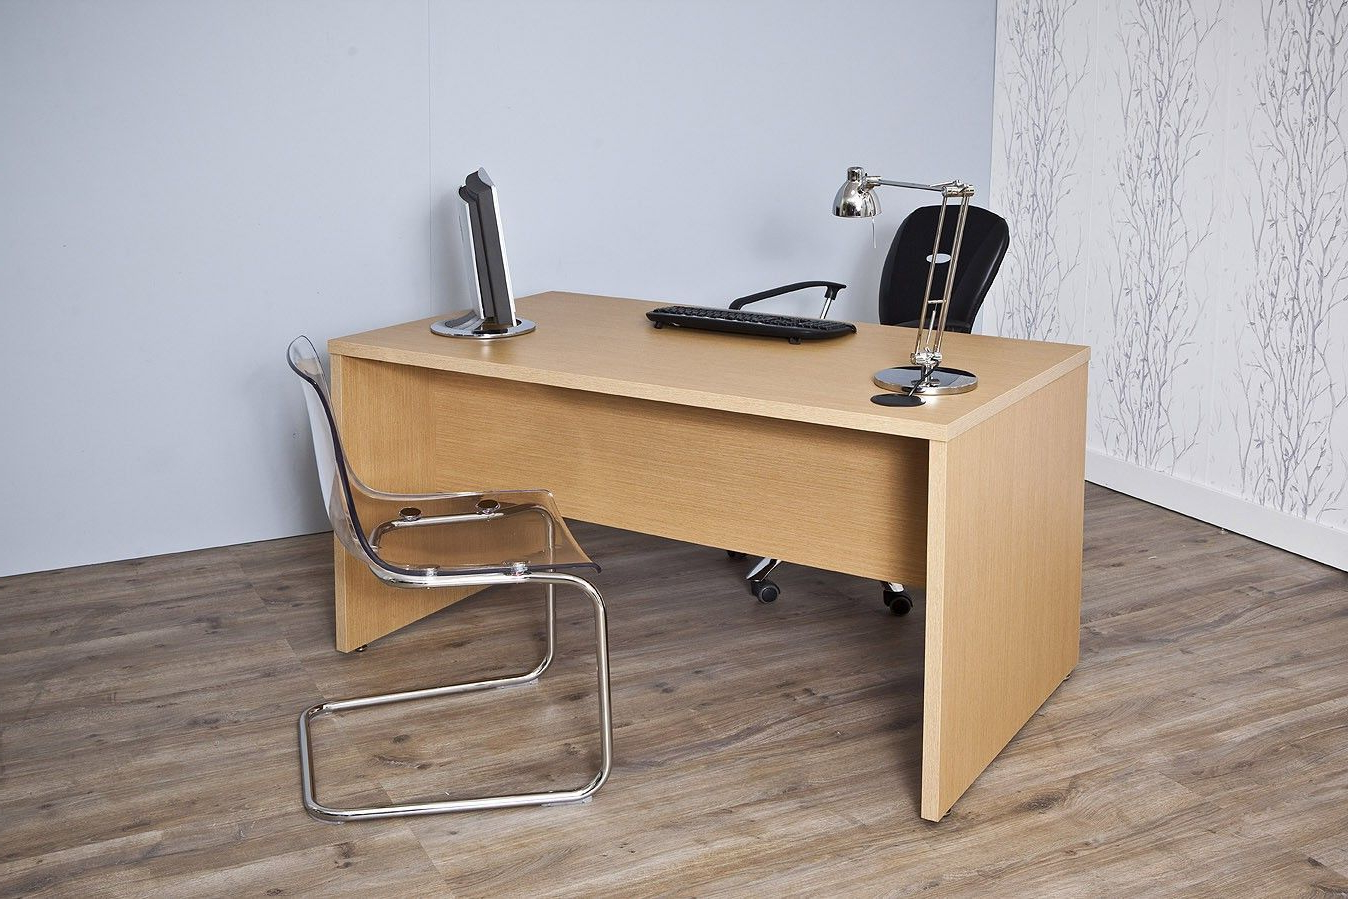 Mesas De Despacho Baratas 0gdr Mesas Despacho Baratas Mesas Y Escritorios Despacho Modernos topkit